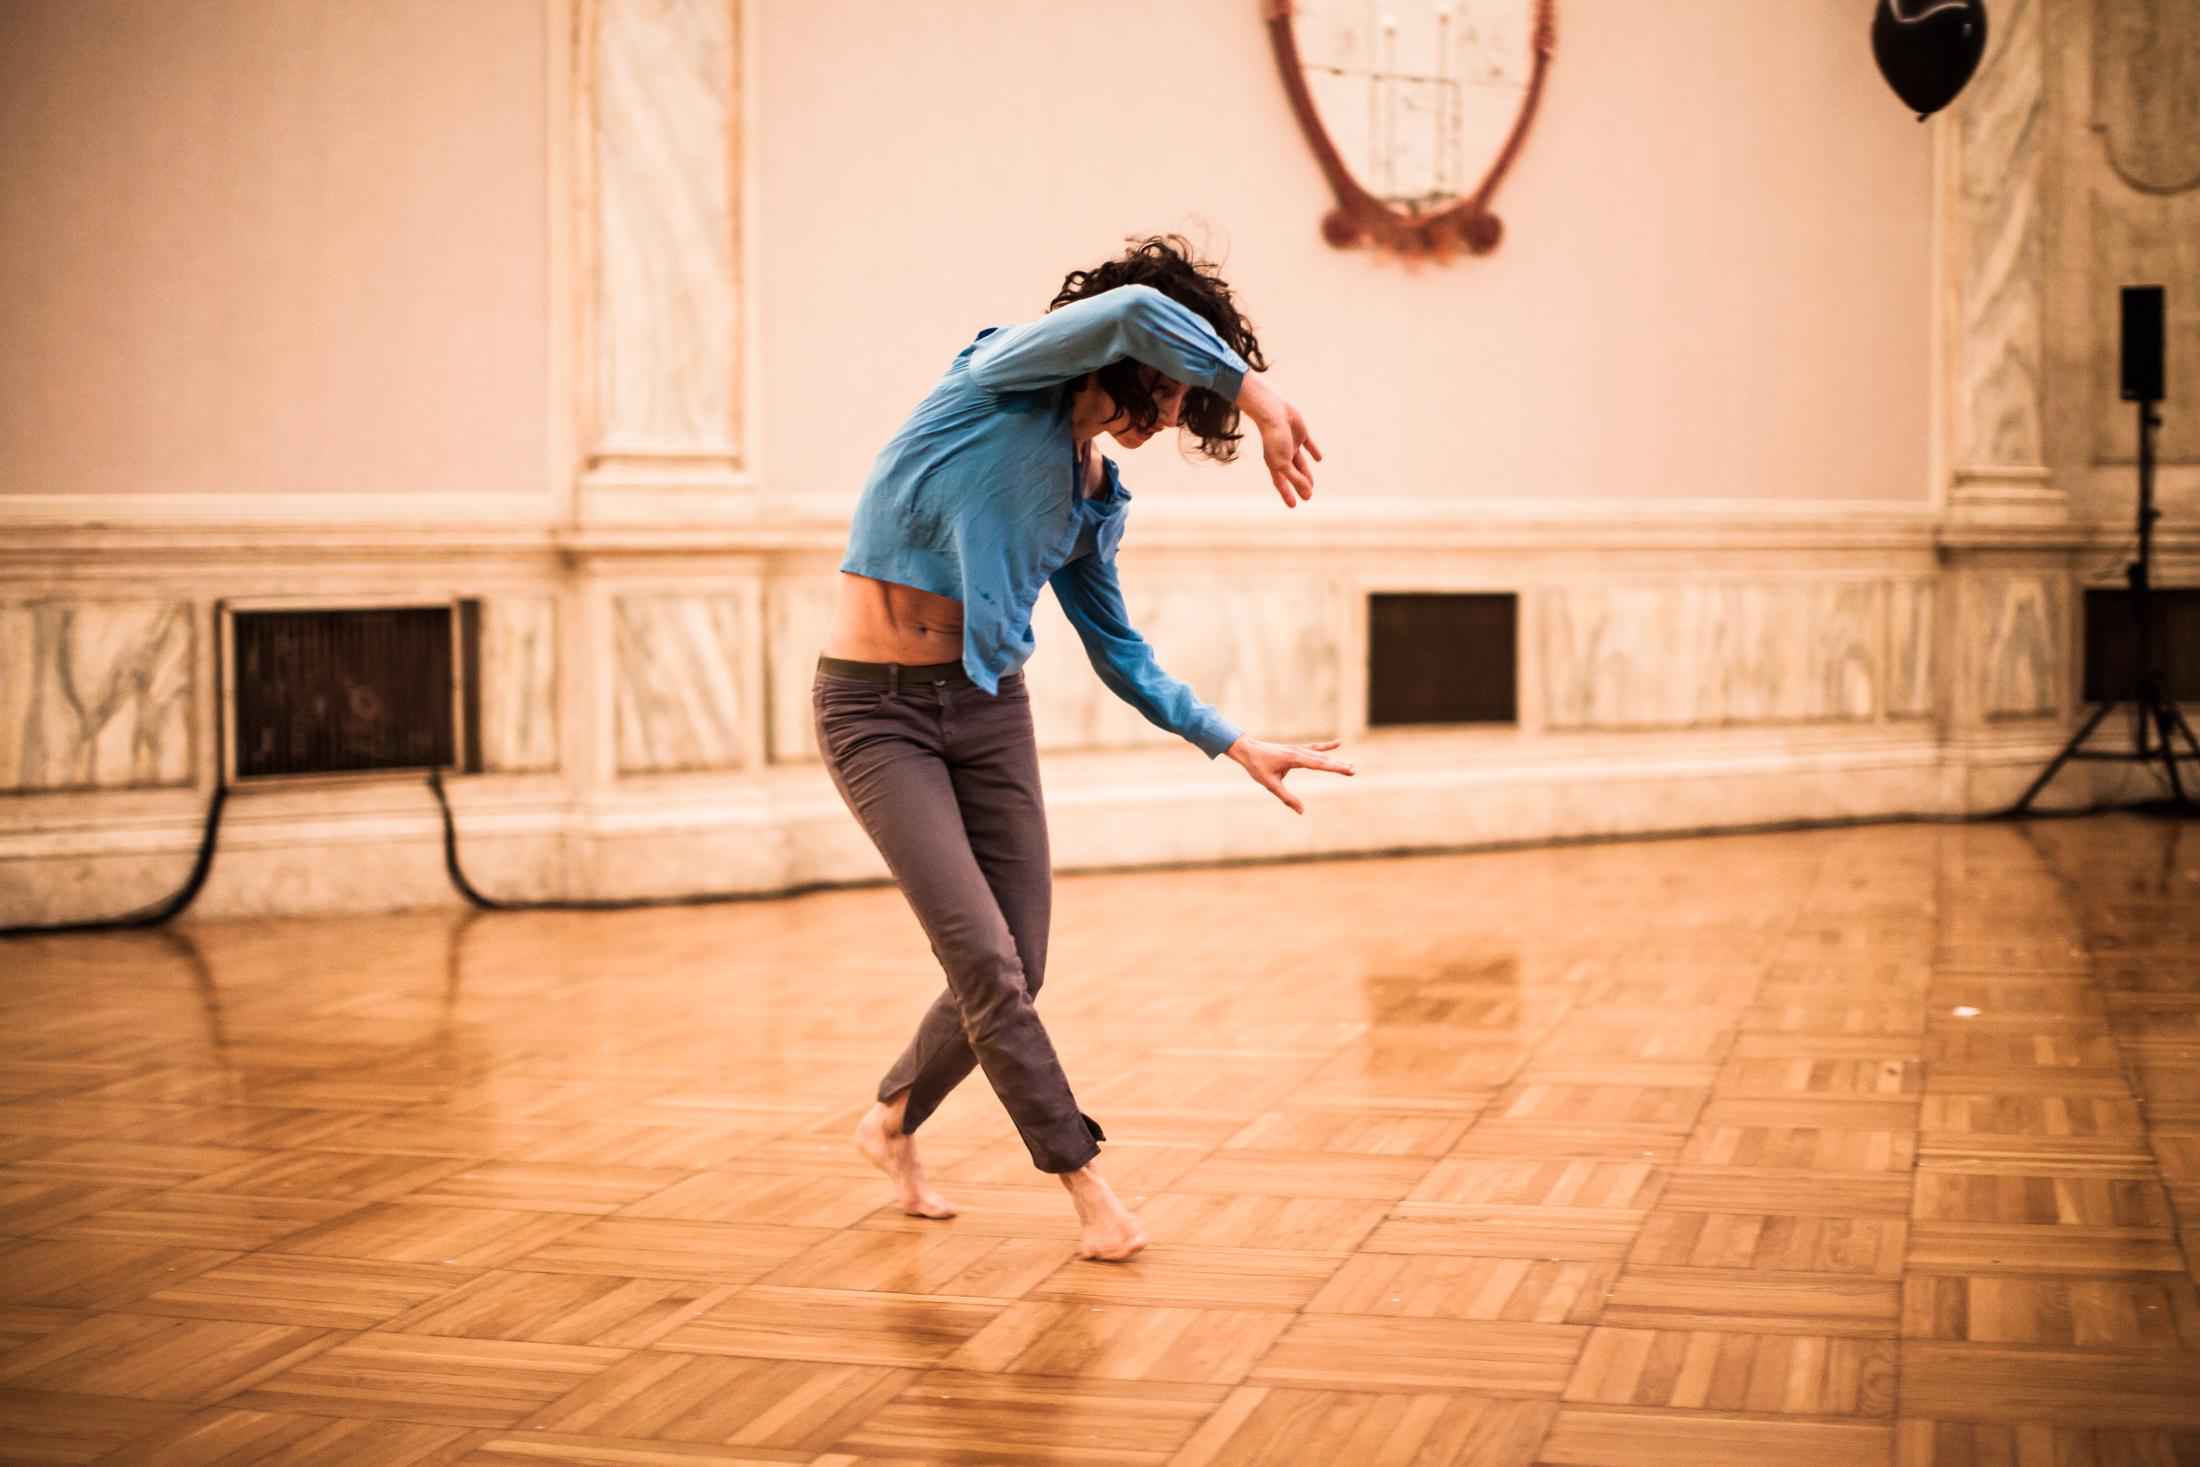 http://www.danzaurbana.eu/associazione/wp-content/uploads/2018/05/Masdanza_C_Basso_2017.jpg